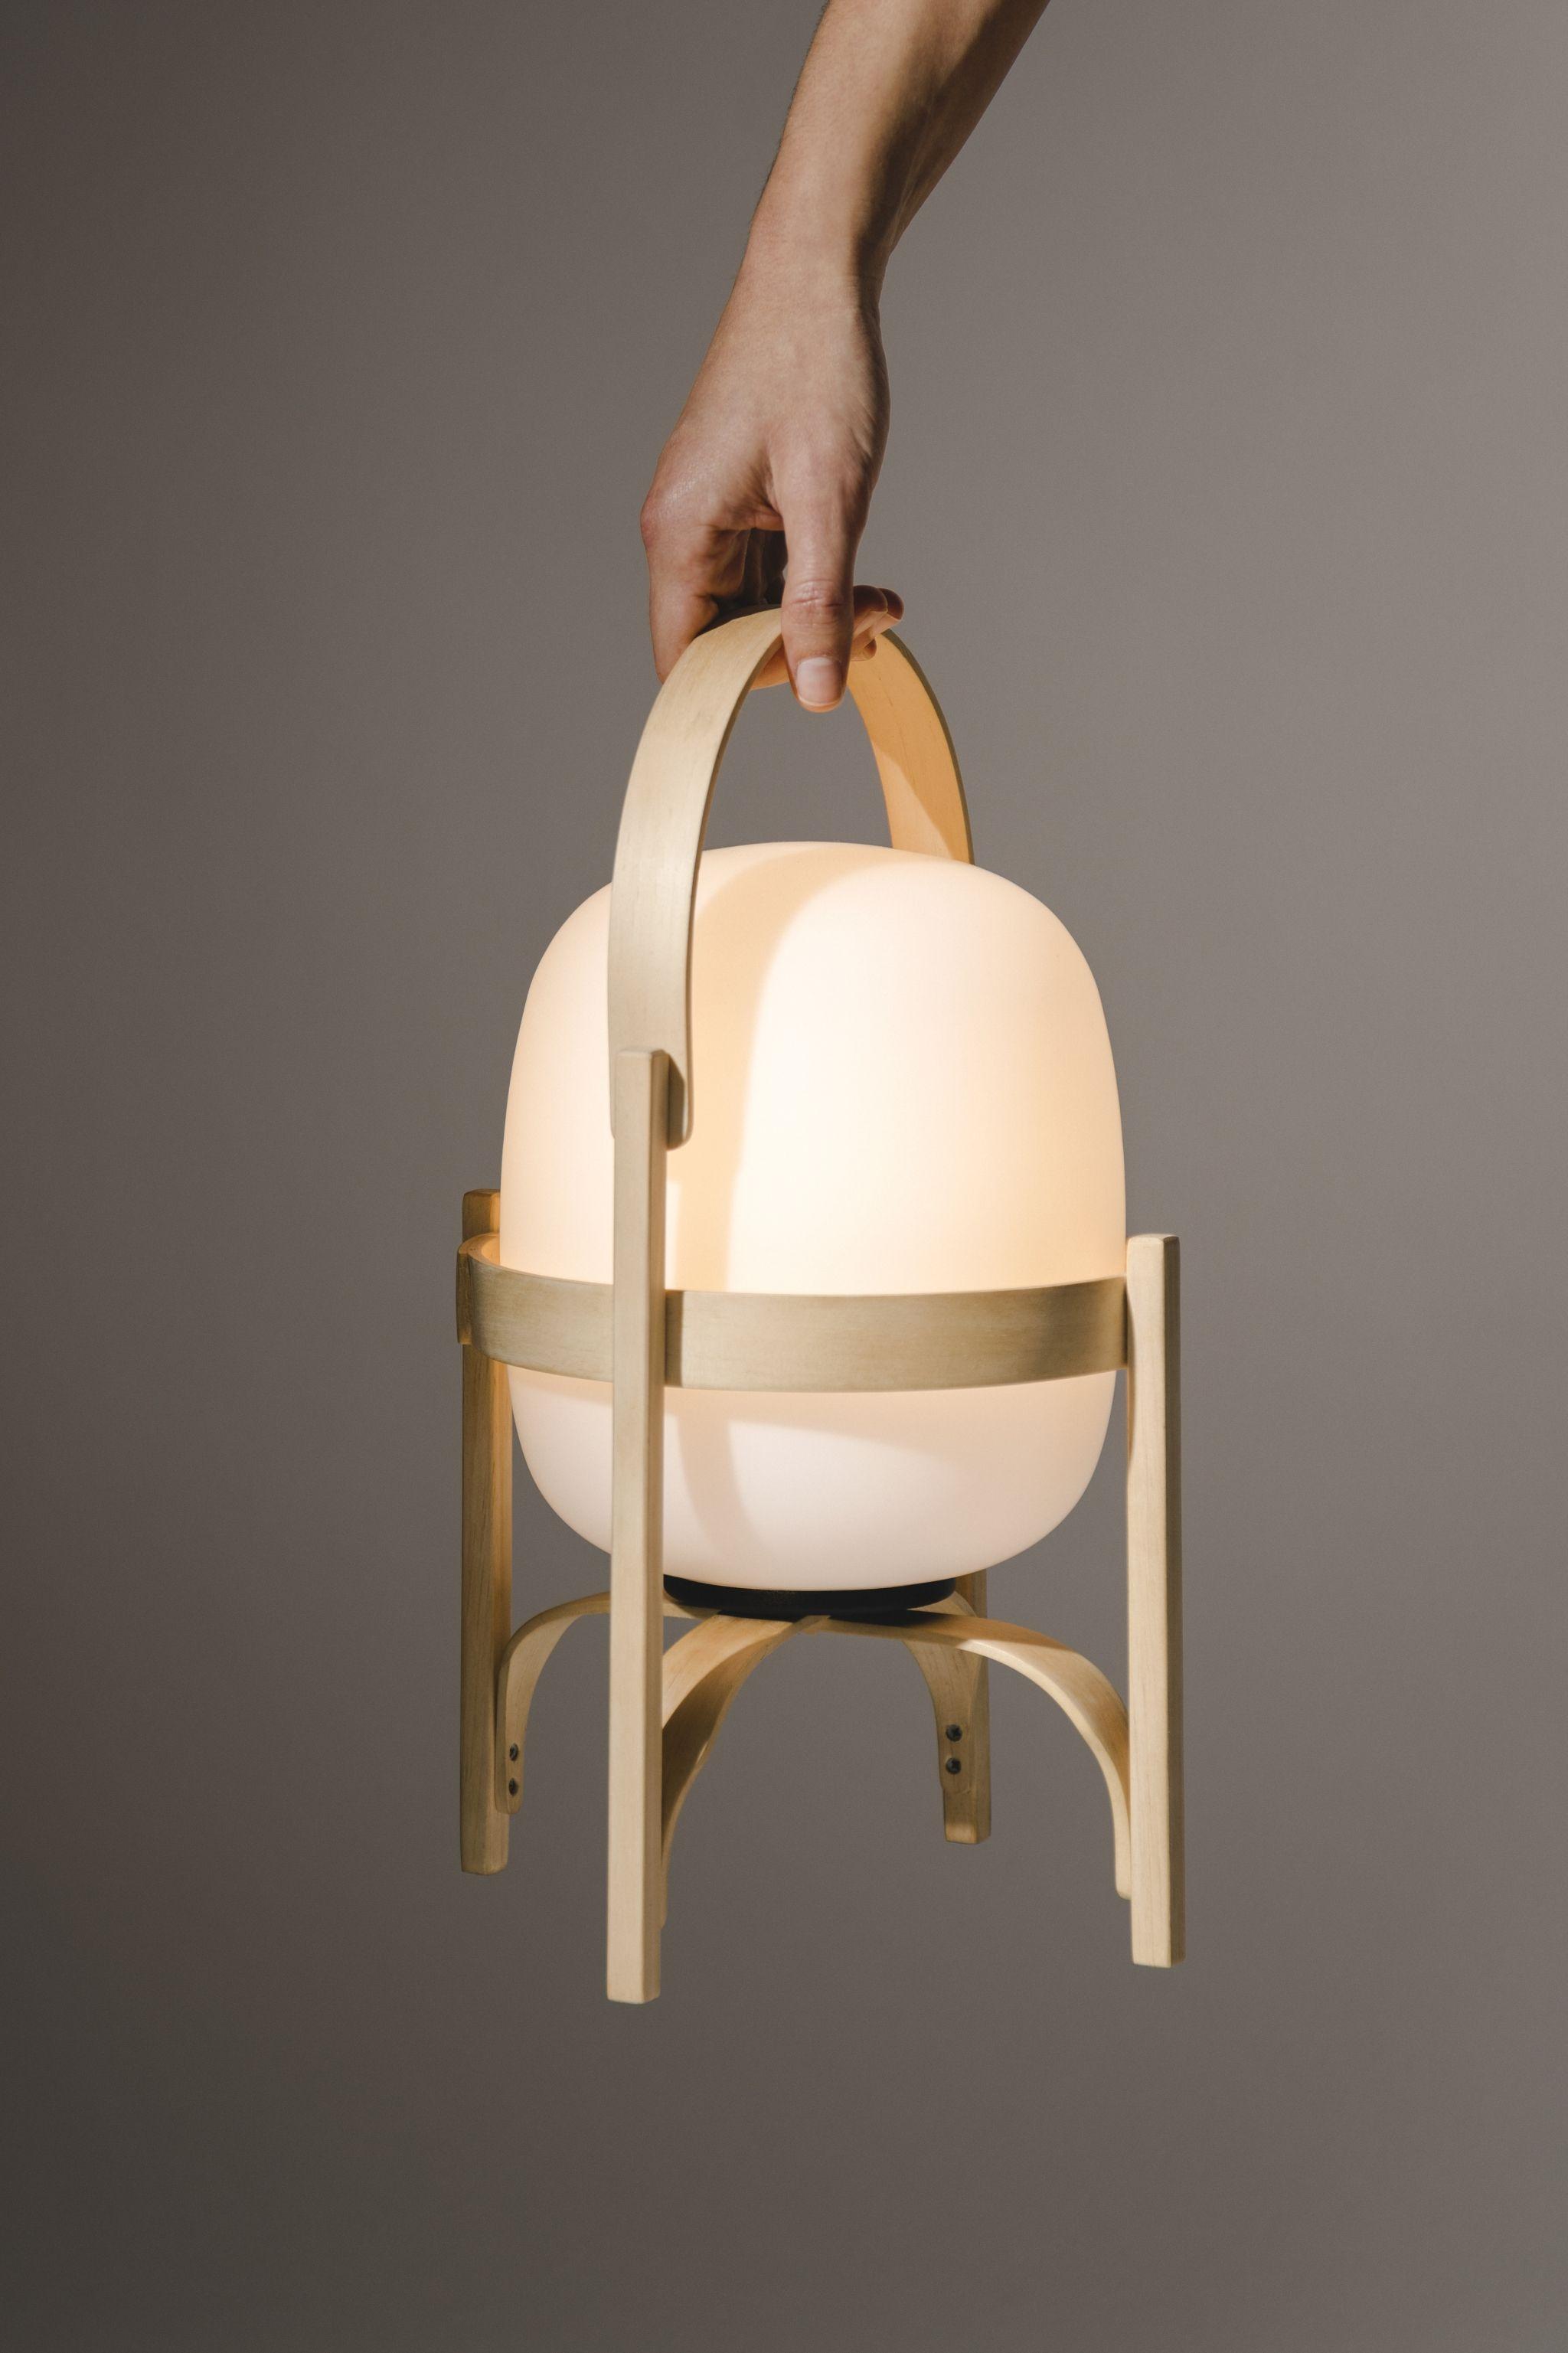 3+ HE - Lighting ideas in 3  lighting, house elements, lamp